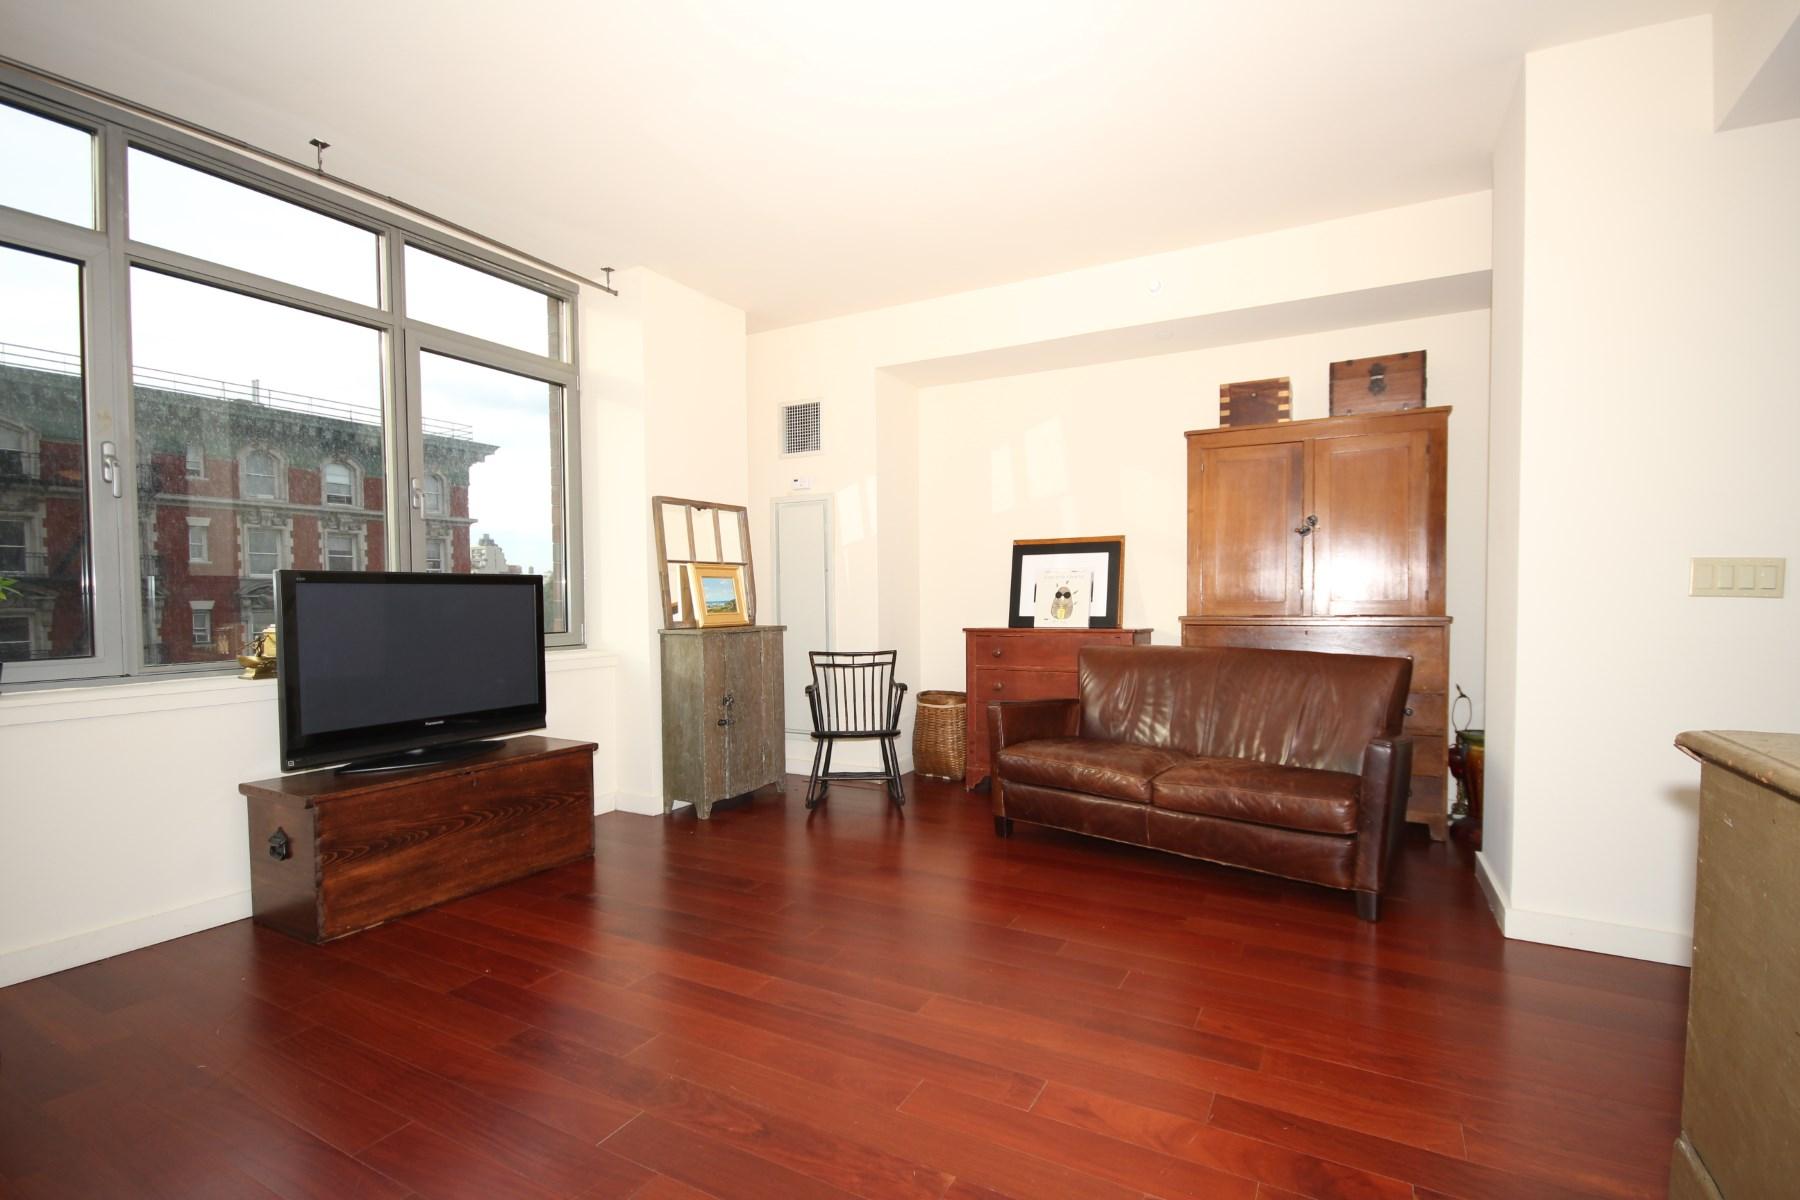 Property Of 1485 Fifth Avenue, Apt 6E